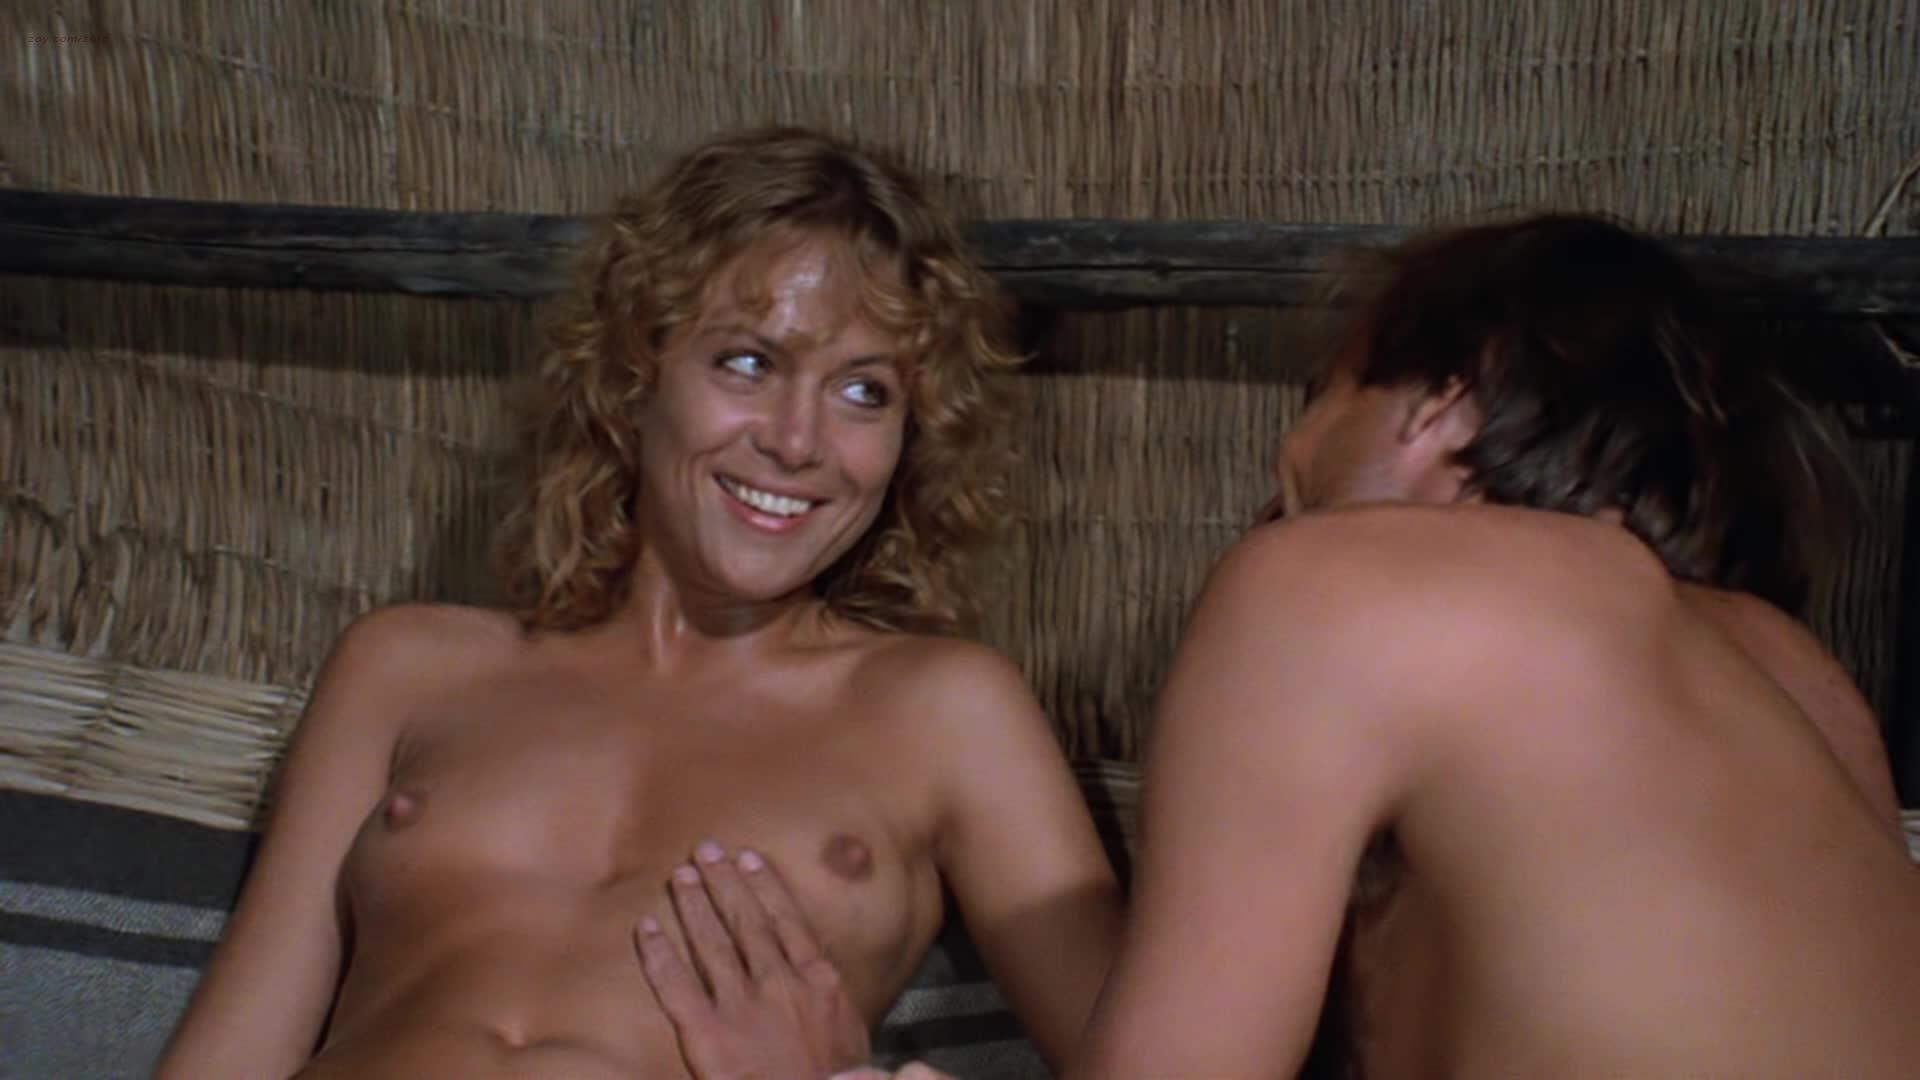 Barbara Rey Porno zora kerova cannibal ferox (it 1981) hd1080p bluray sex